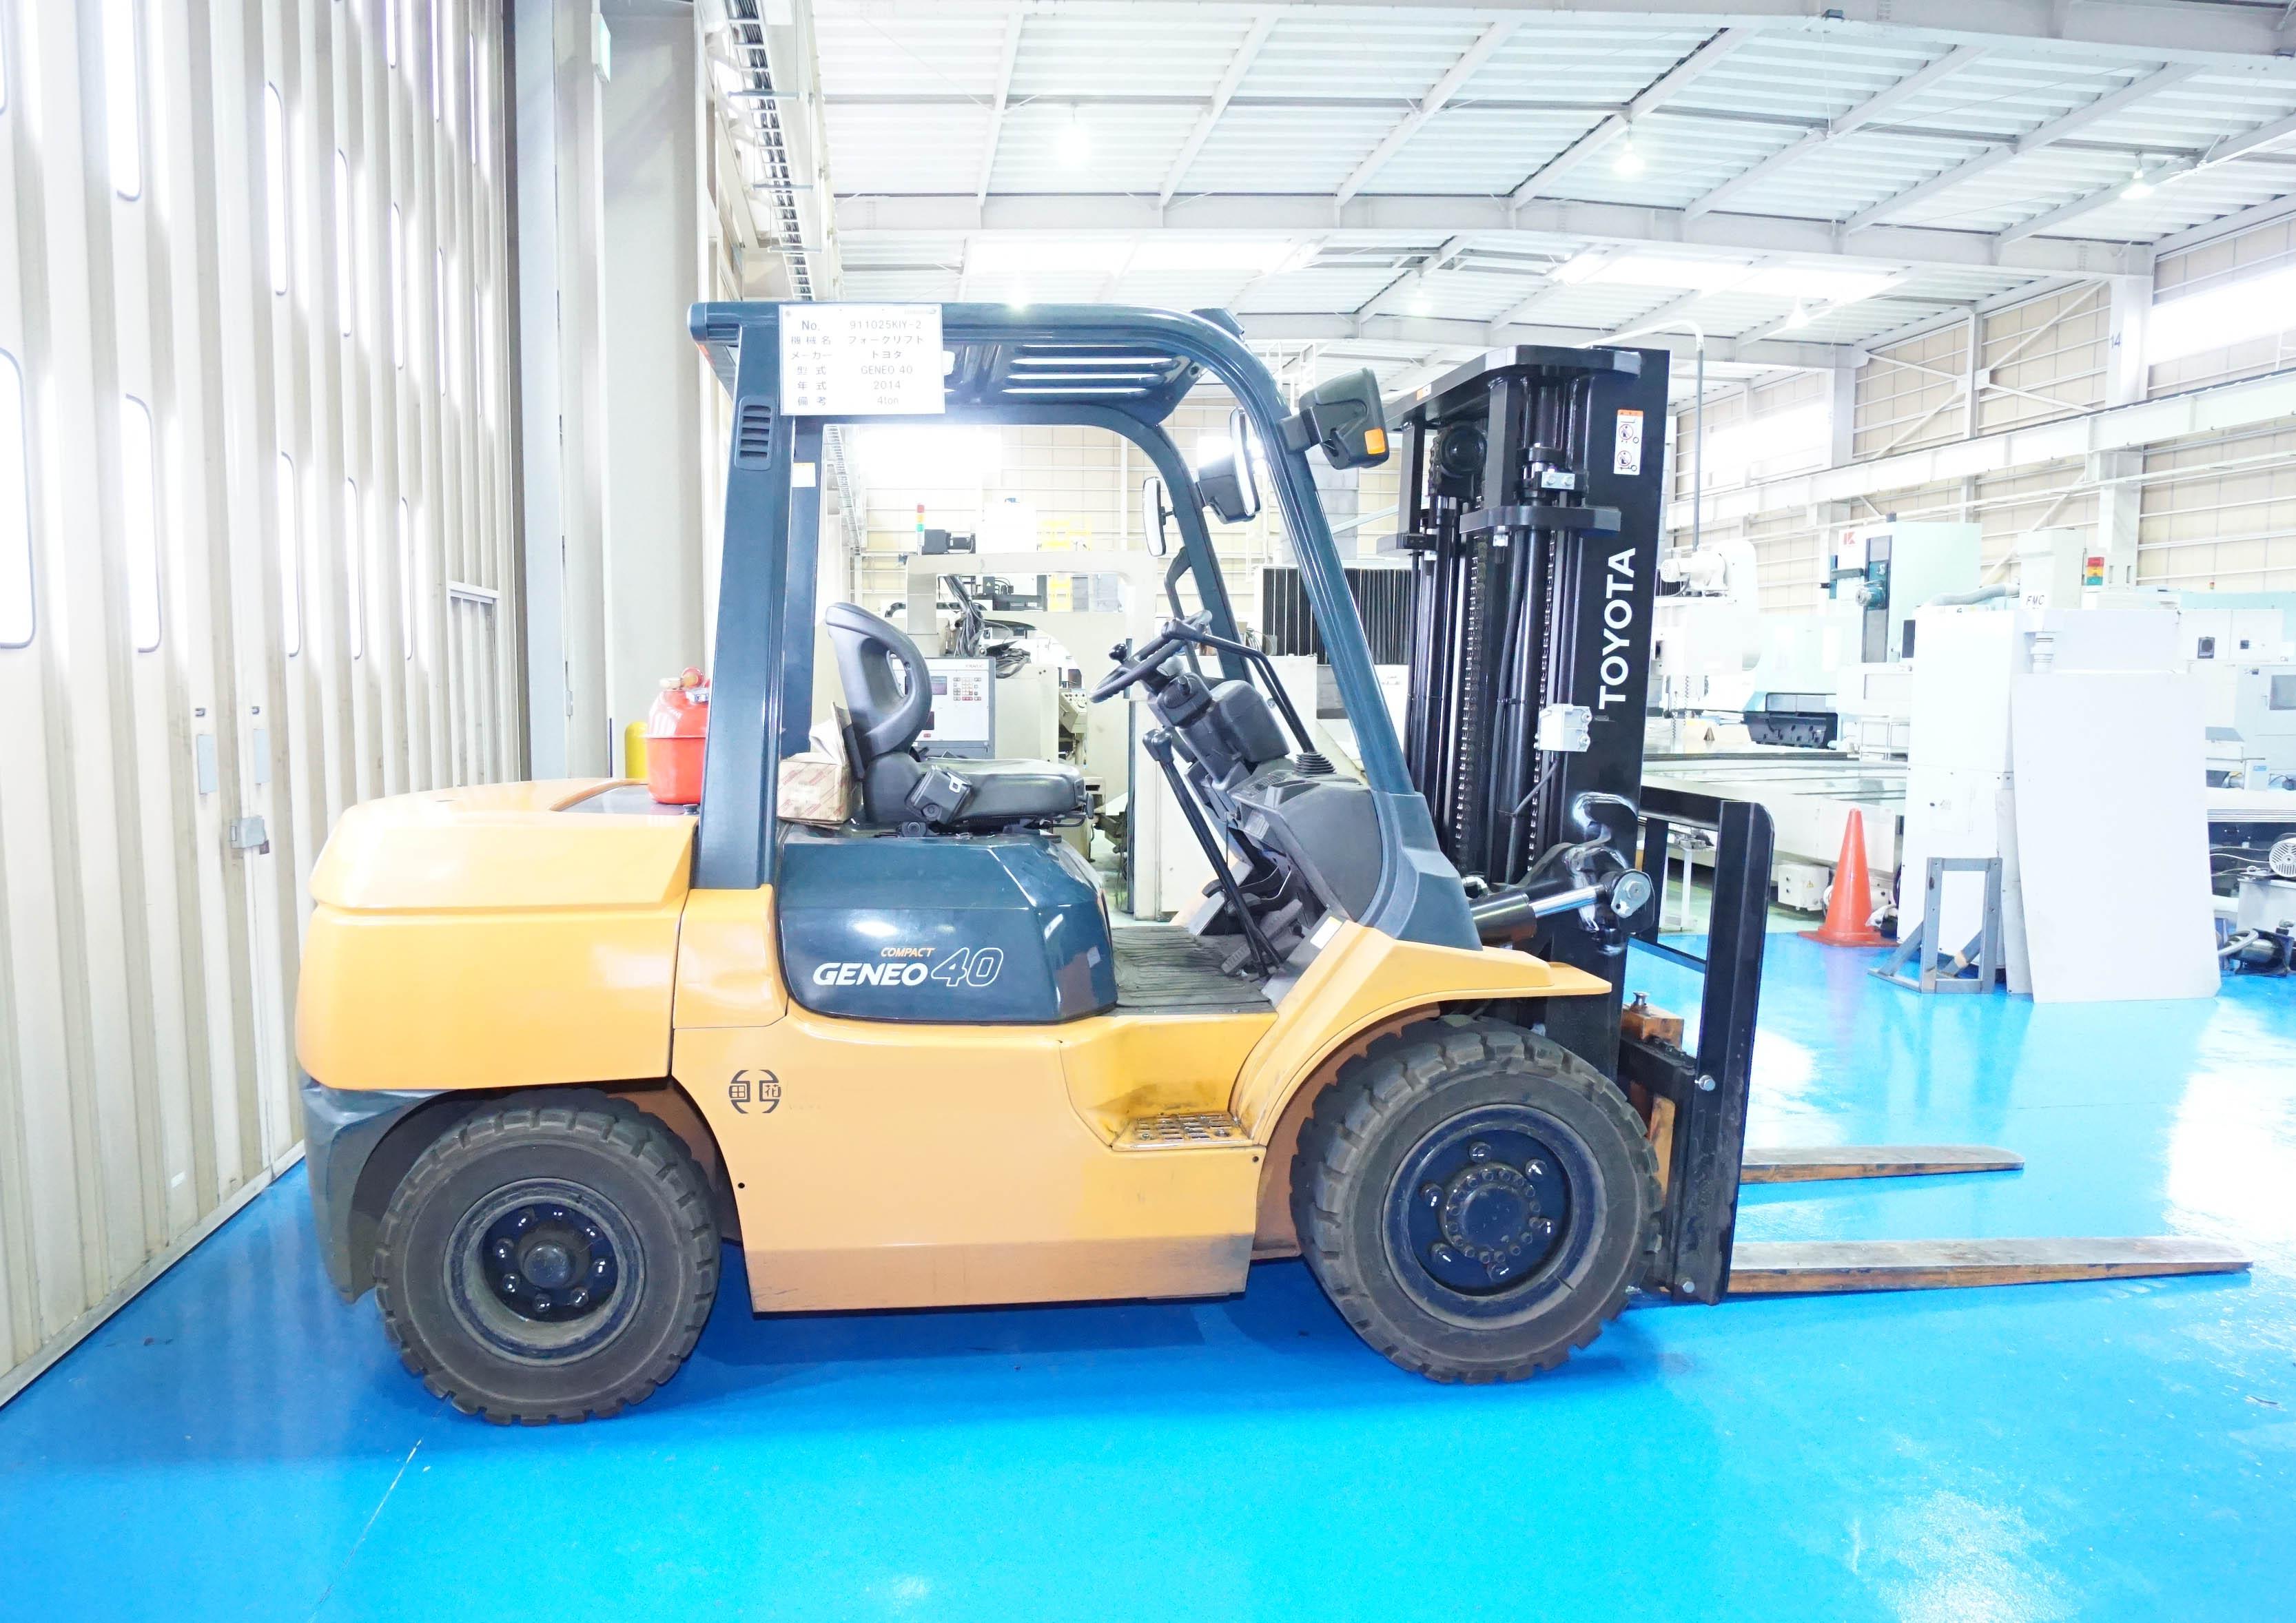 Transporting Handling Machinery